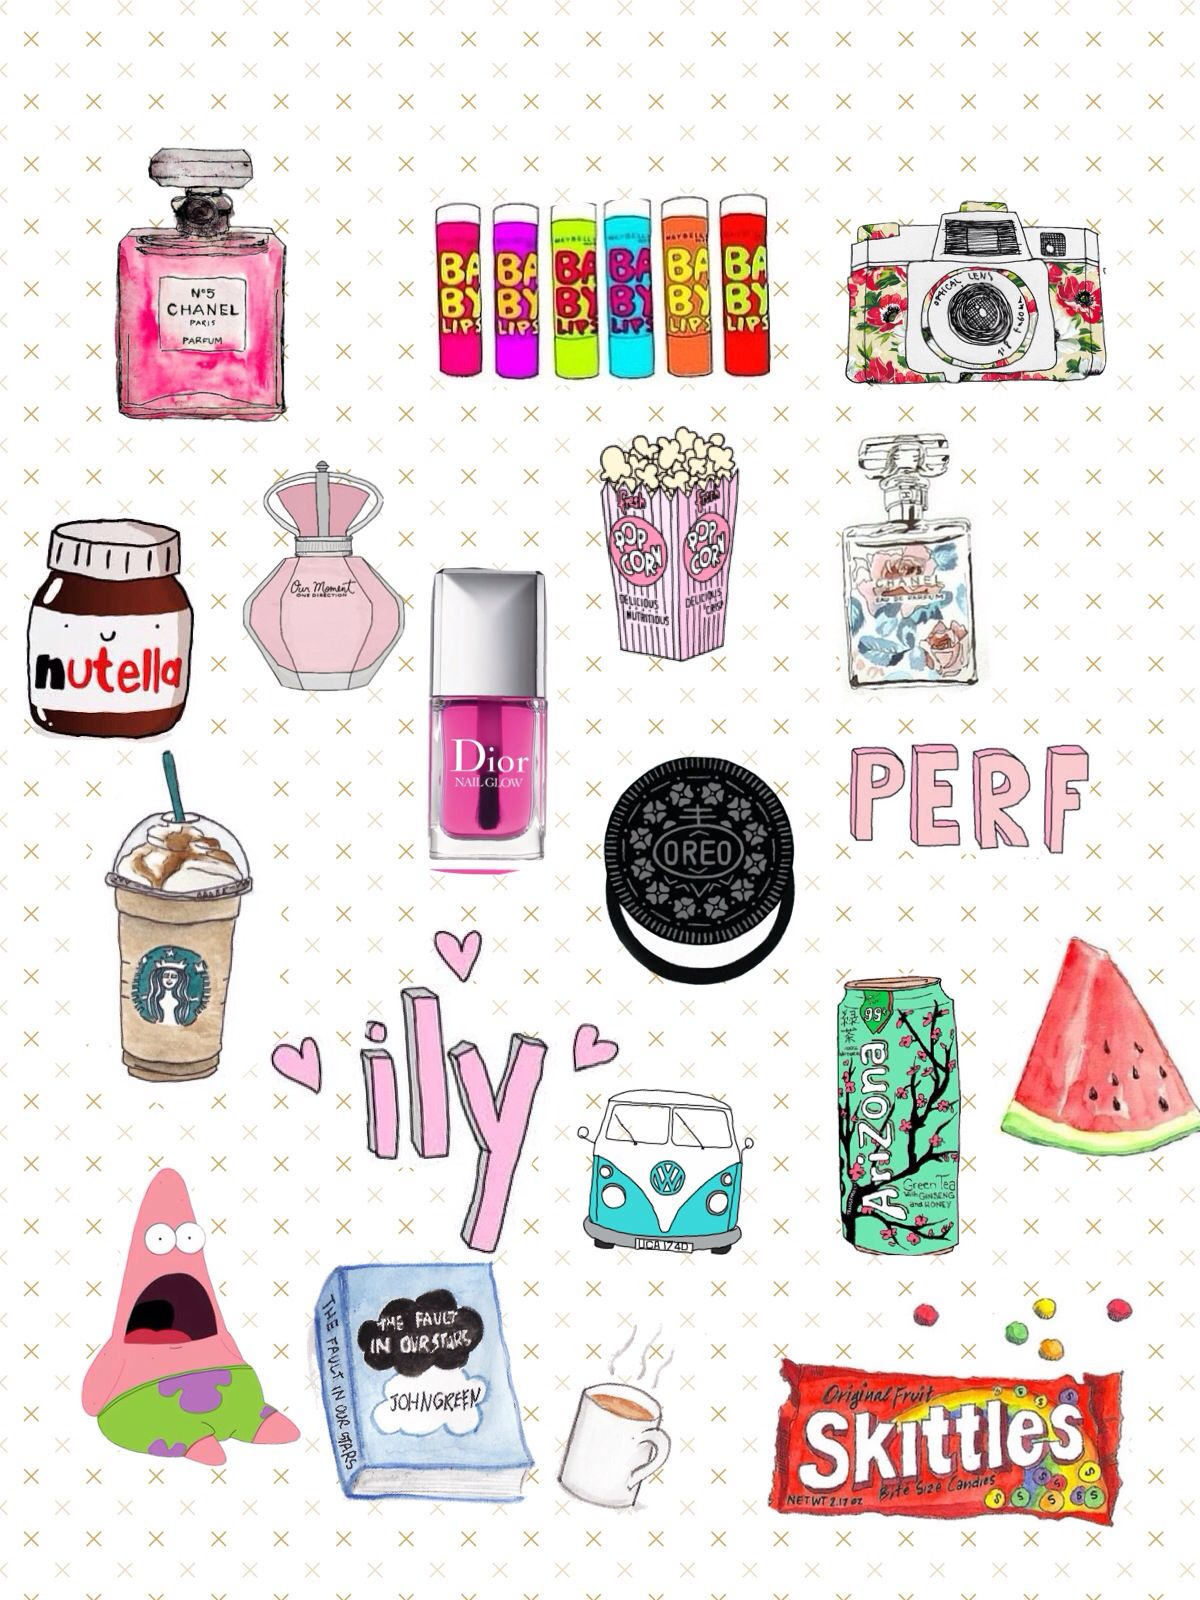 Pin By Soojin Yoon On Fond D Ecran Tumblr Stickers Aesthetic Stickers Emoji Wallpaper